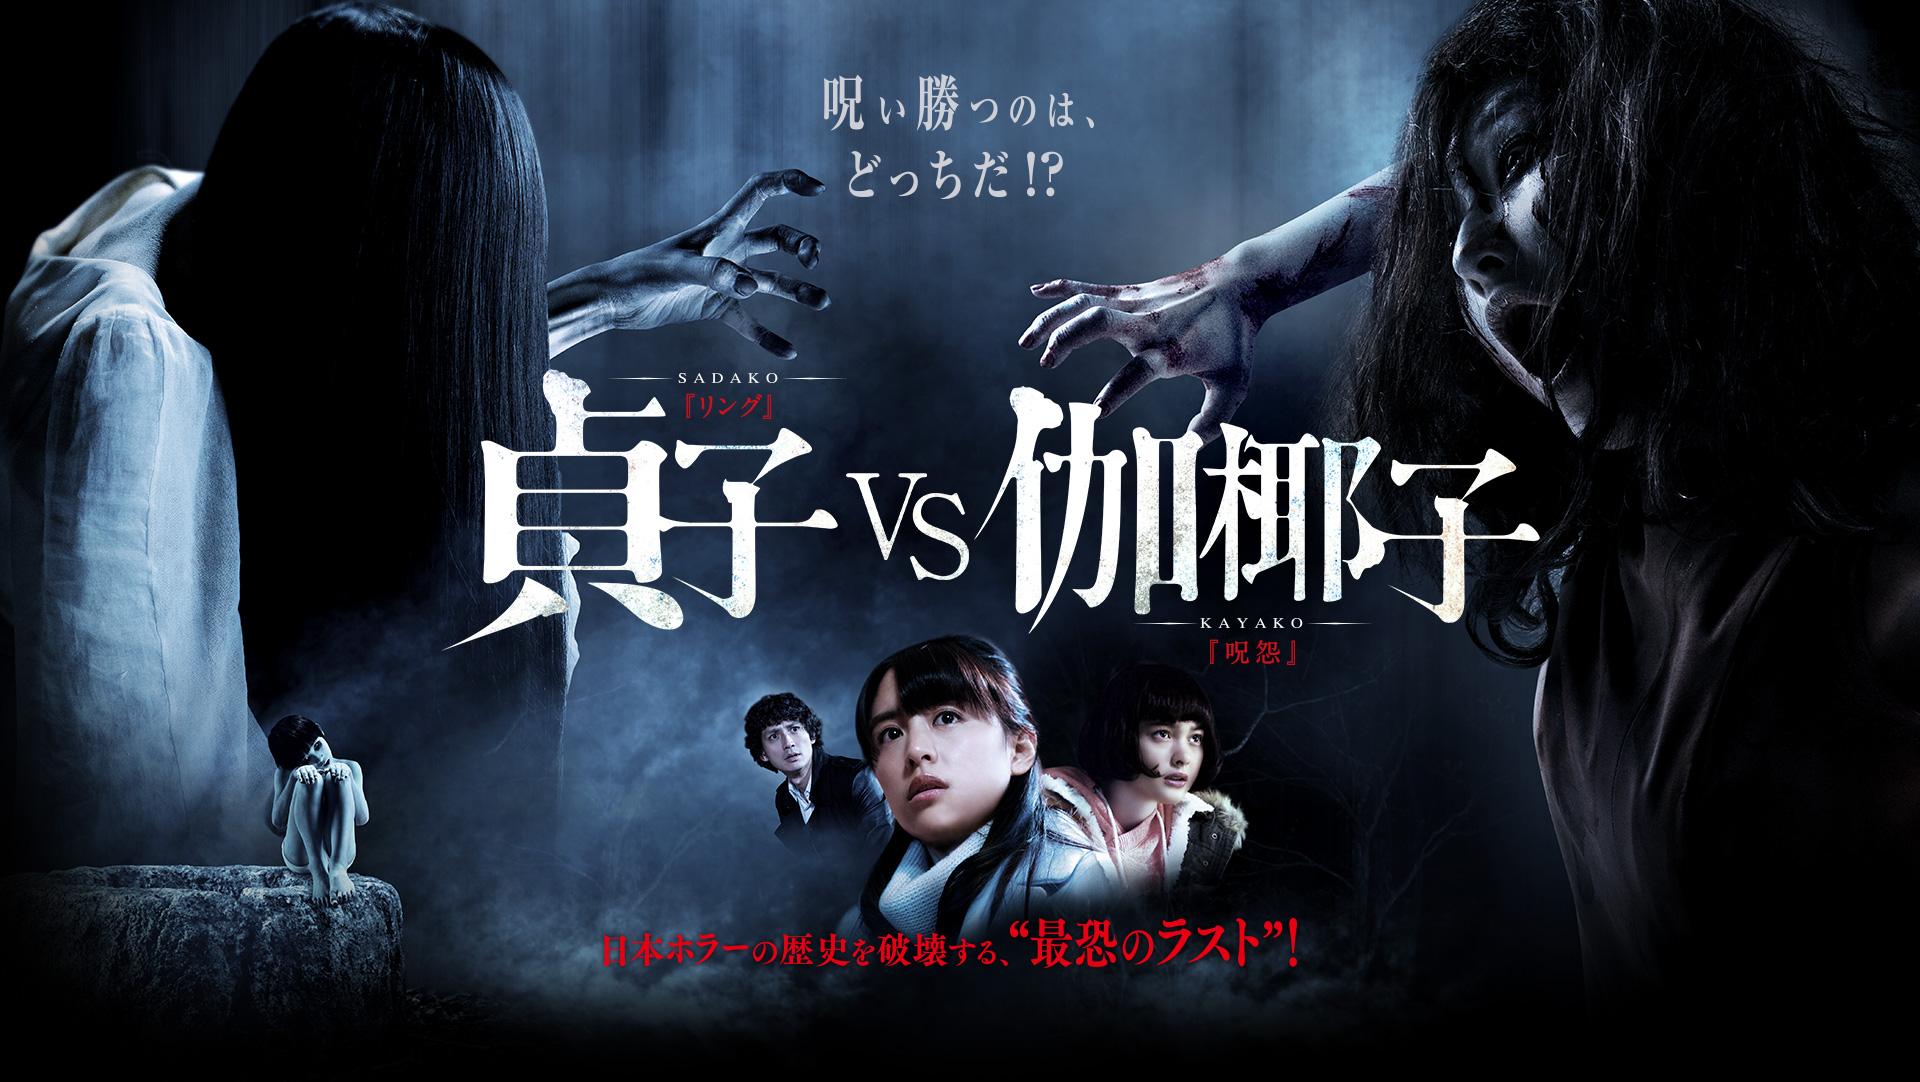 Drama-MAX-Sadako-vs-Kayako-poster-2